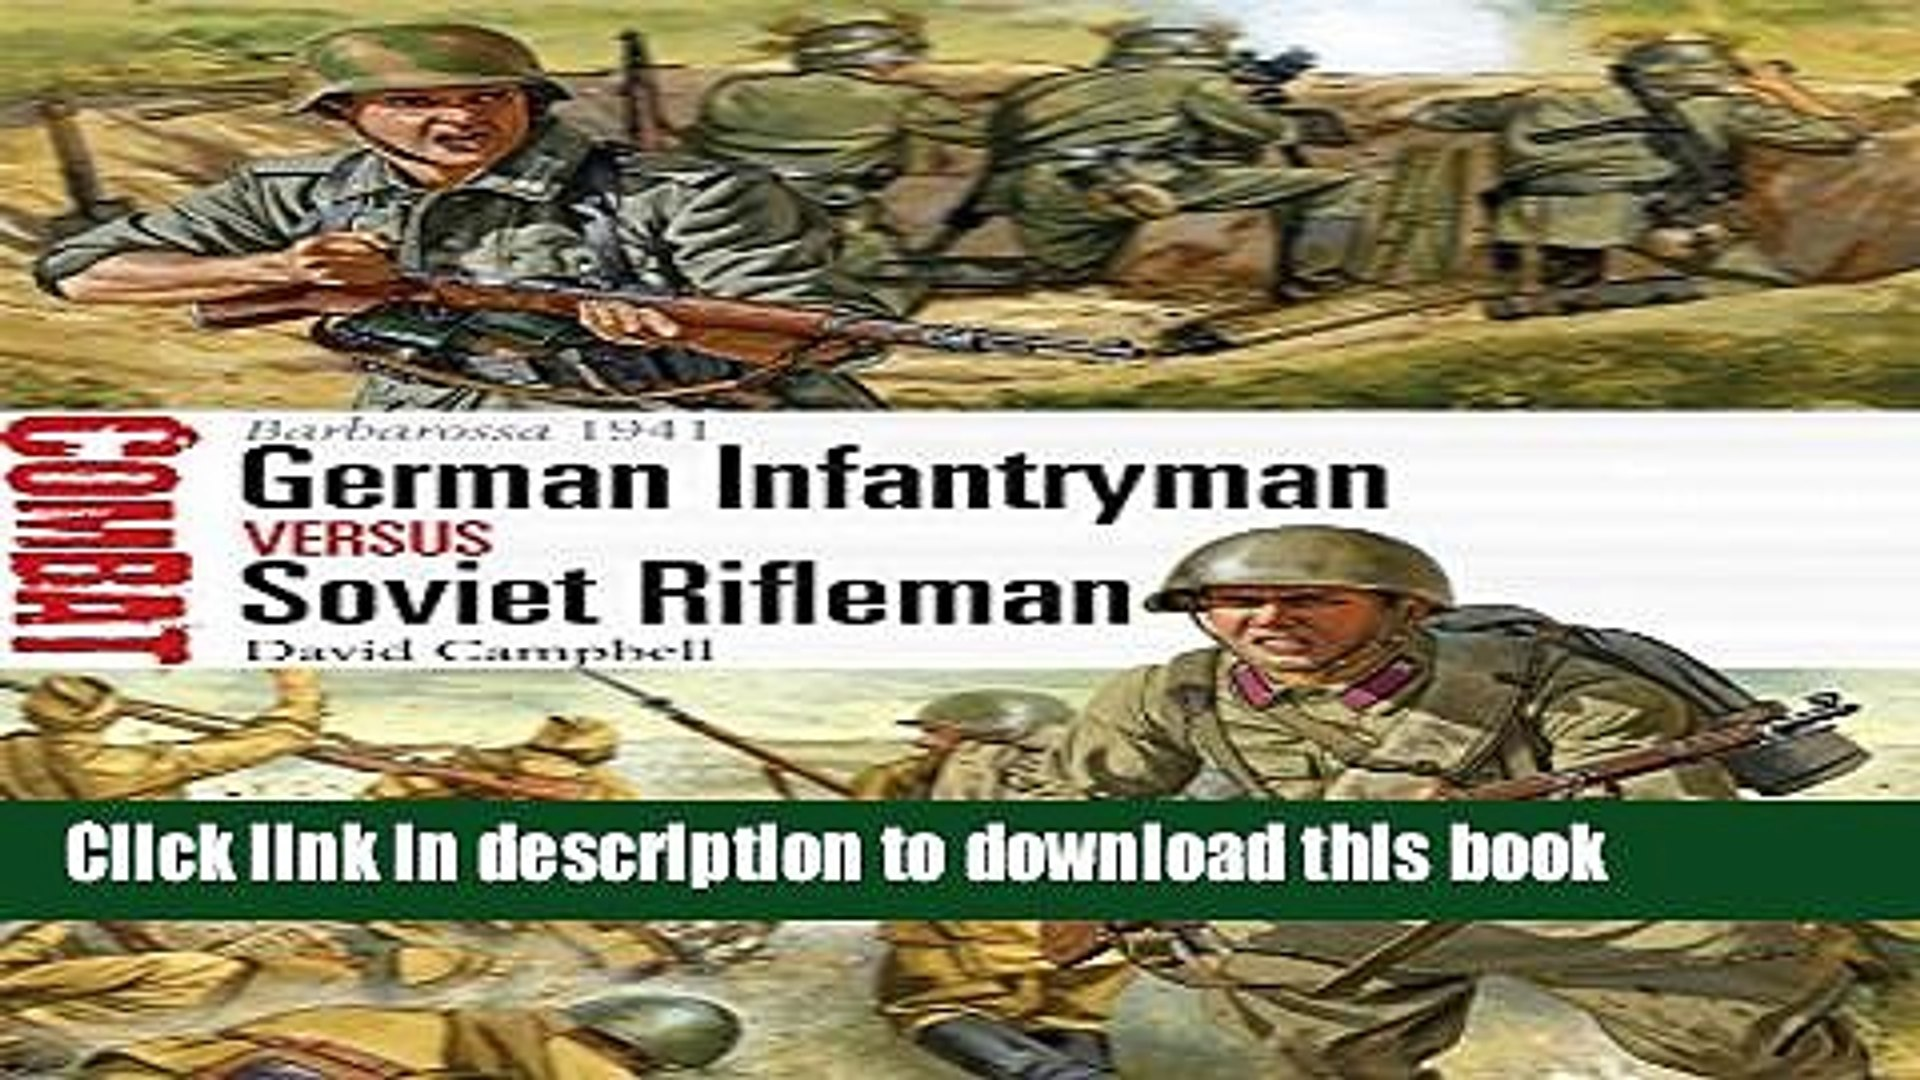 [Popular] Books German Infantryman vs Soviet Rifleman: Somme 1916 Full Download